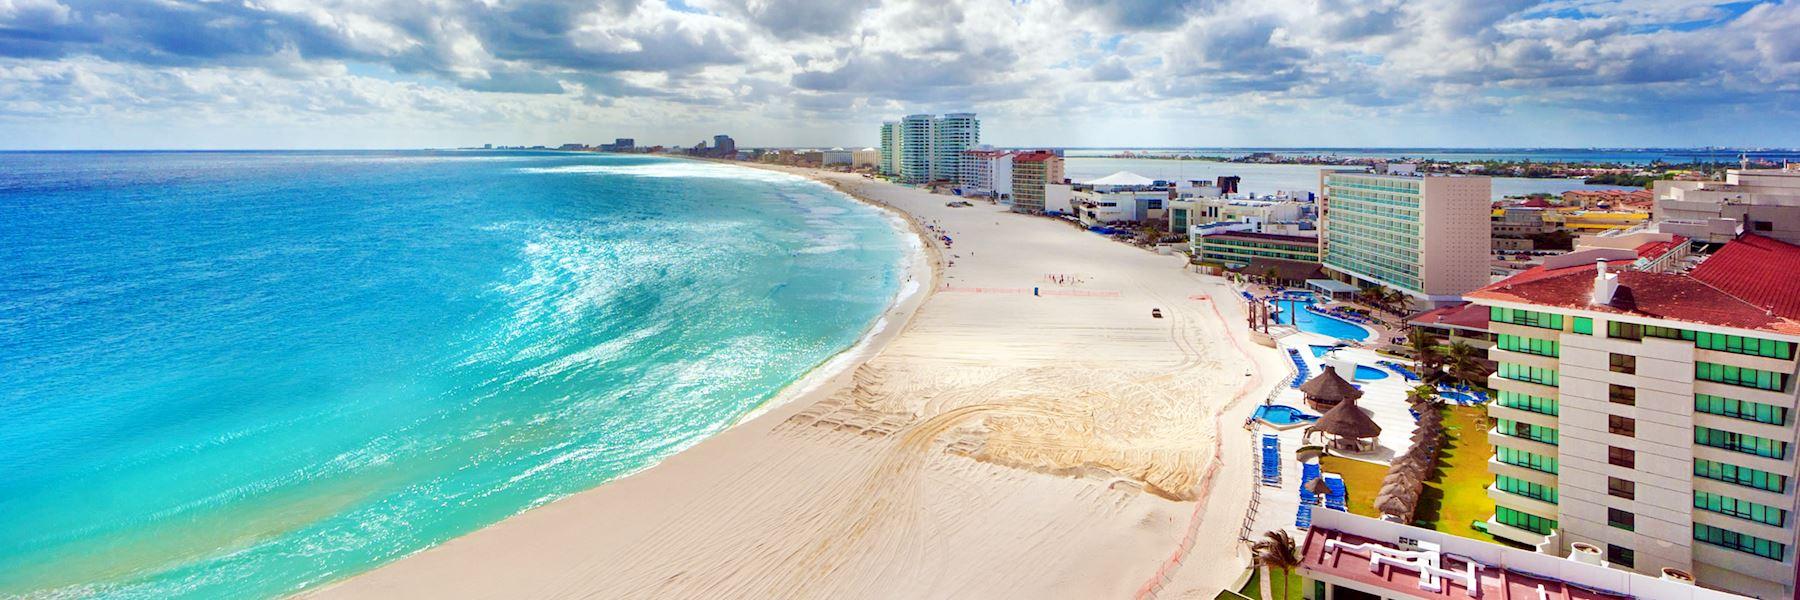 how to plan cancun trip